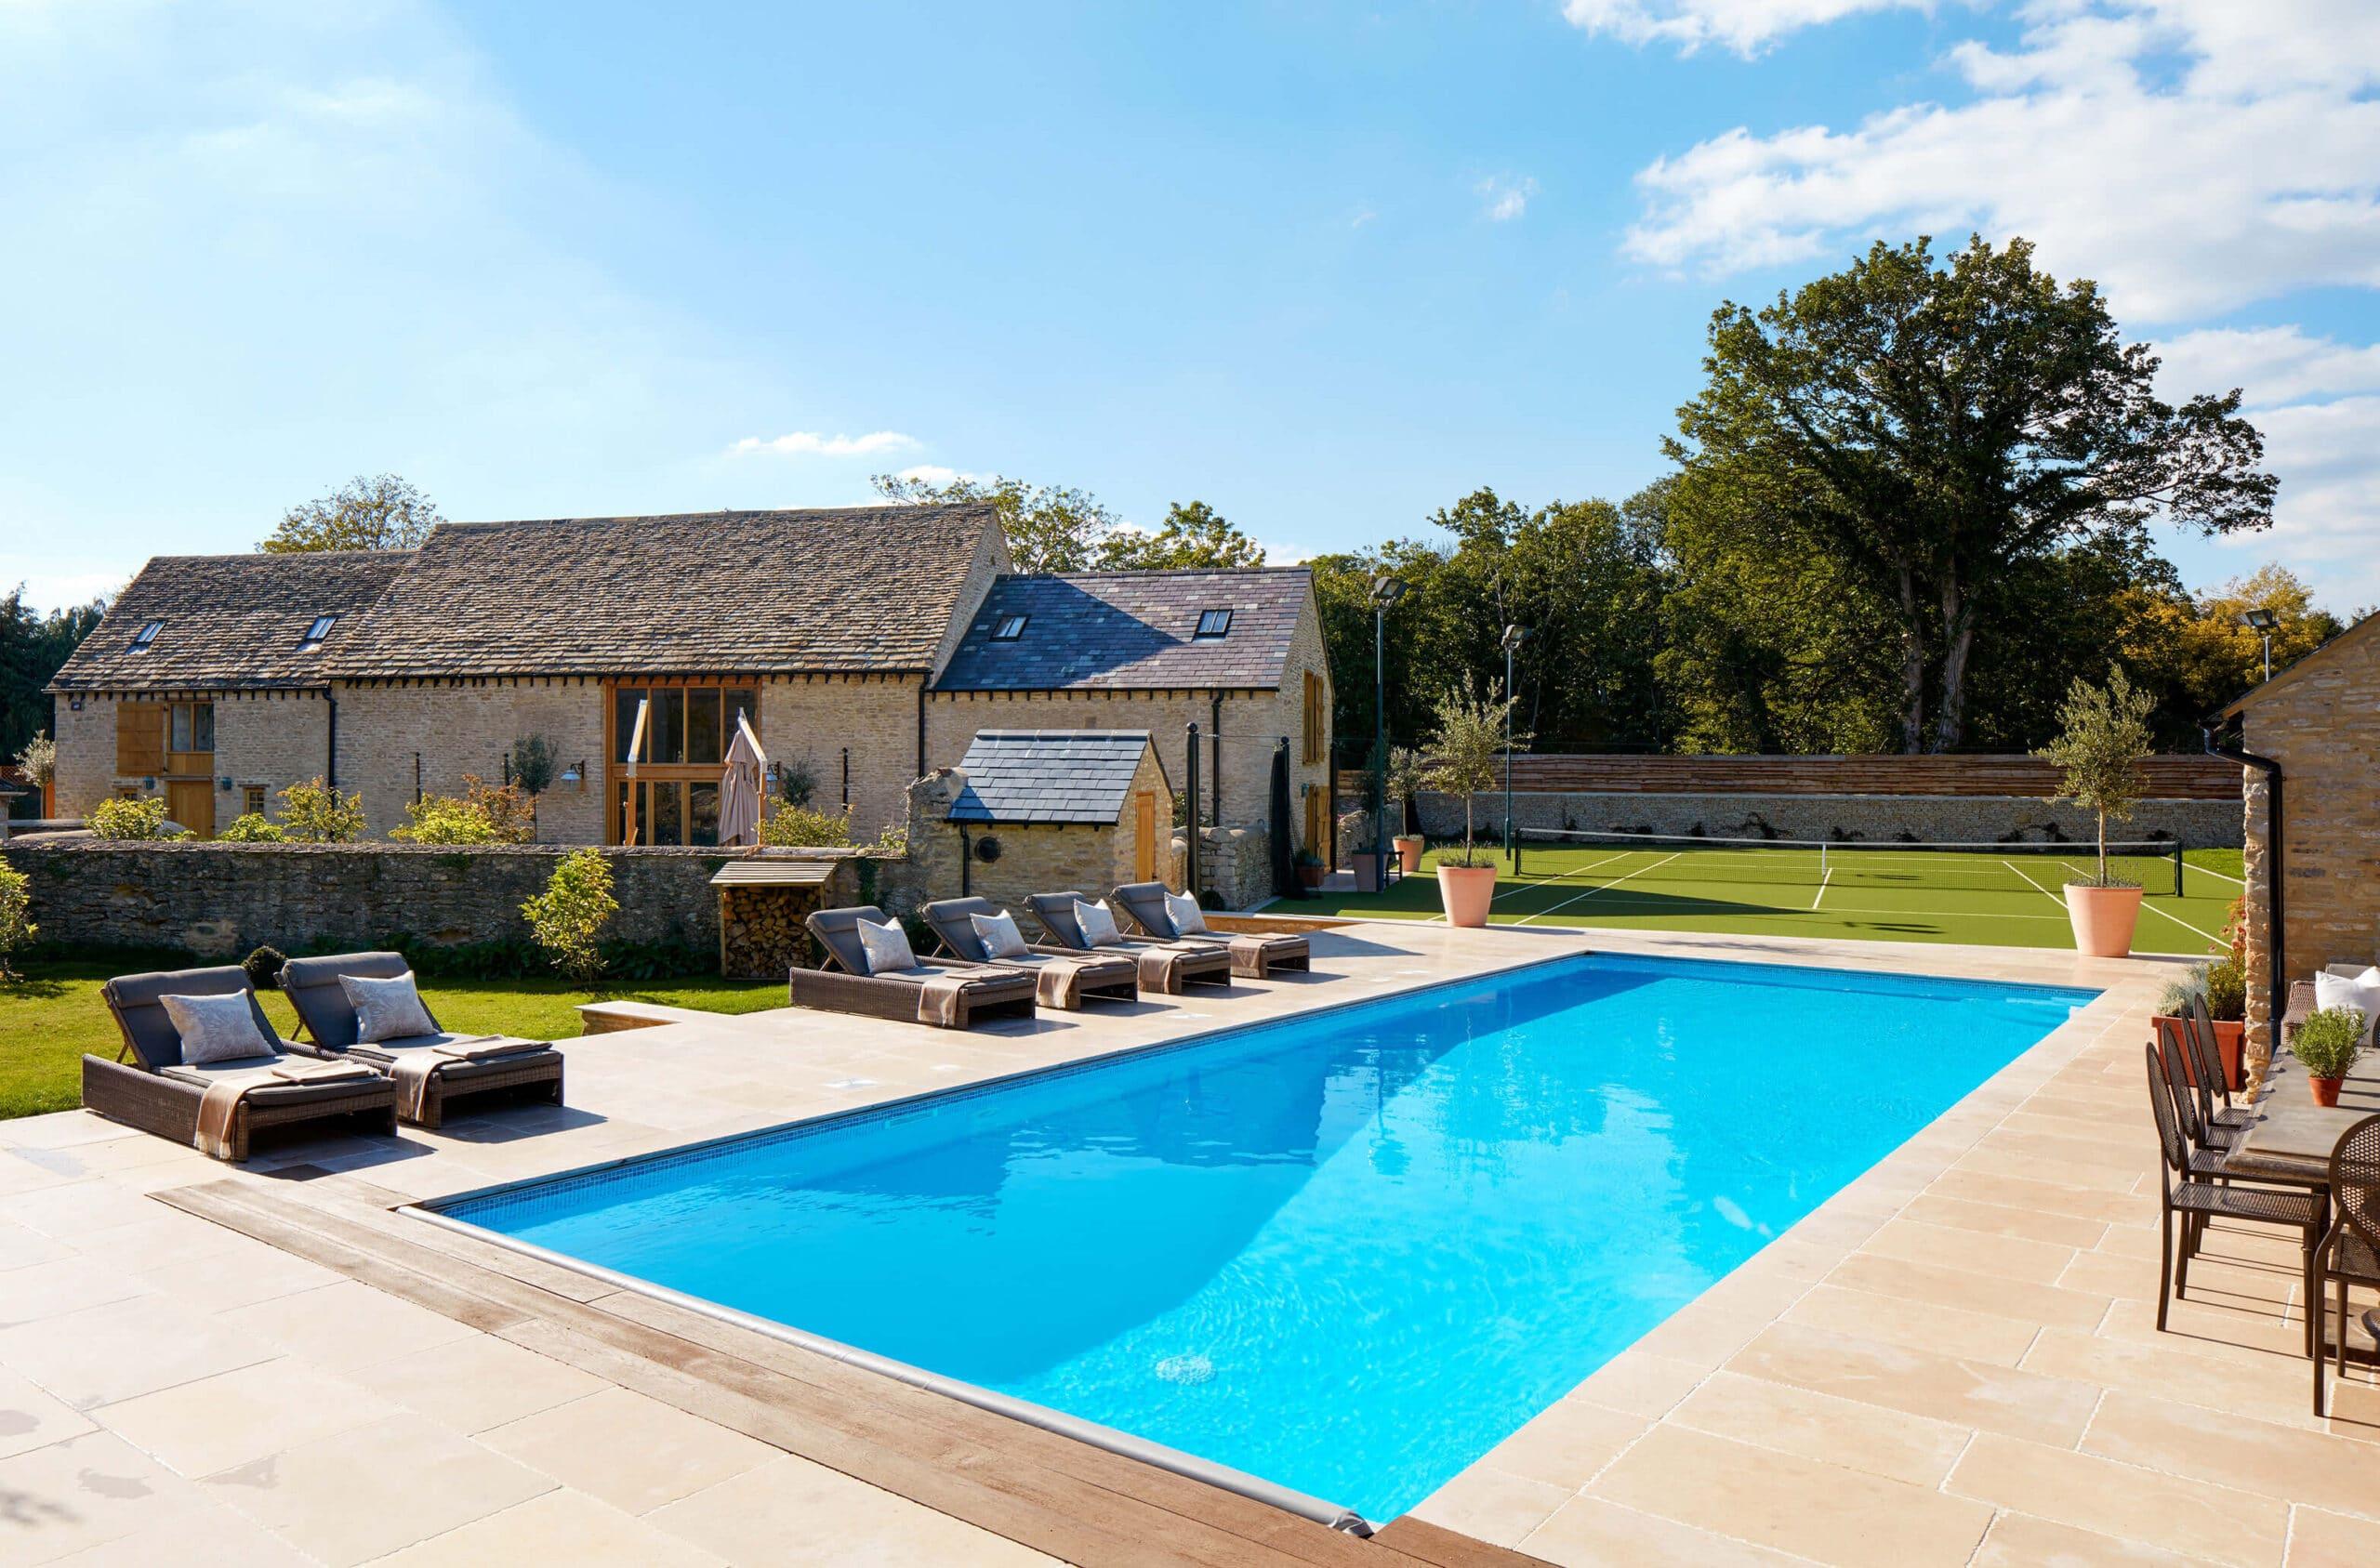 Swimming pool in luxury barn conversion